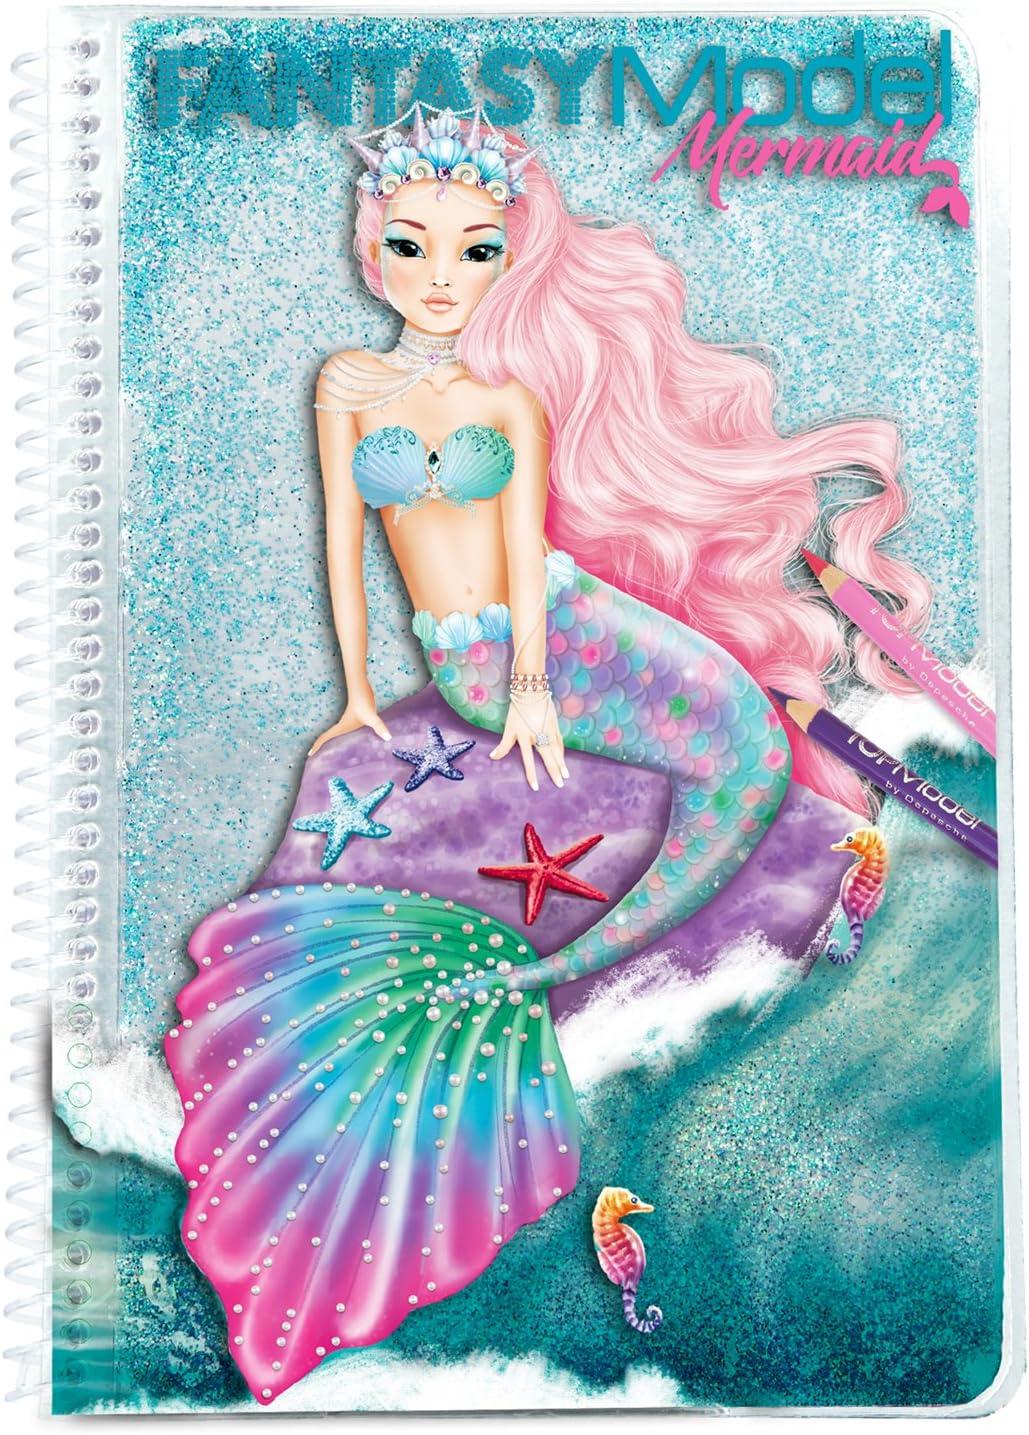 Fort Worth Mall Spasm price Depesche 10036 Fantasy Model Book Colouring Mermaid Multicolour